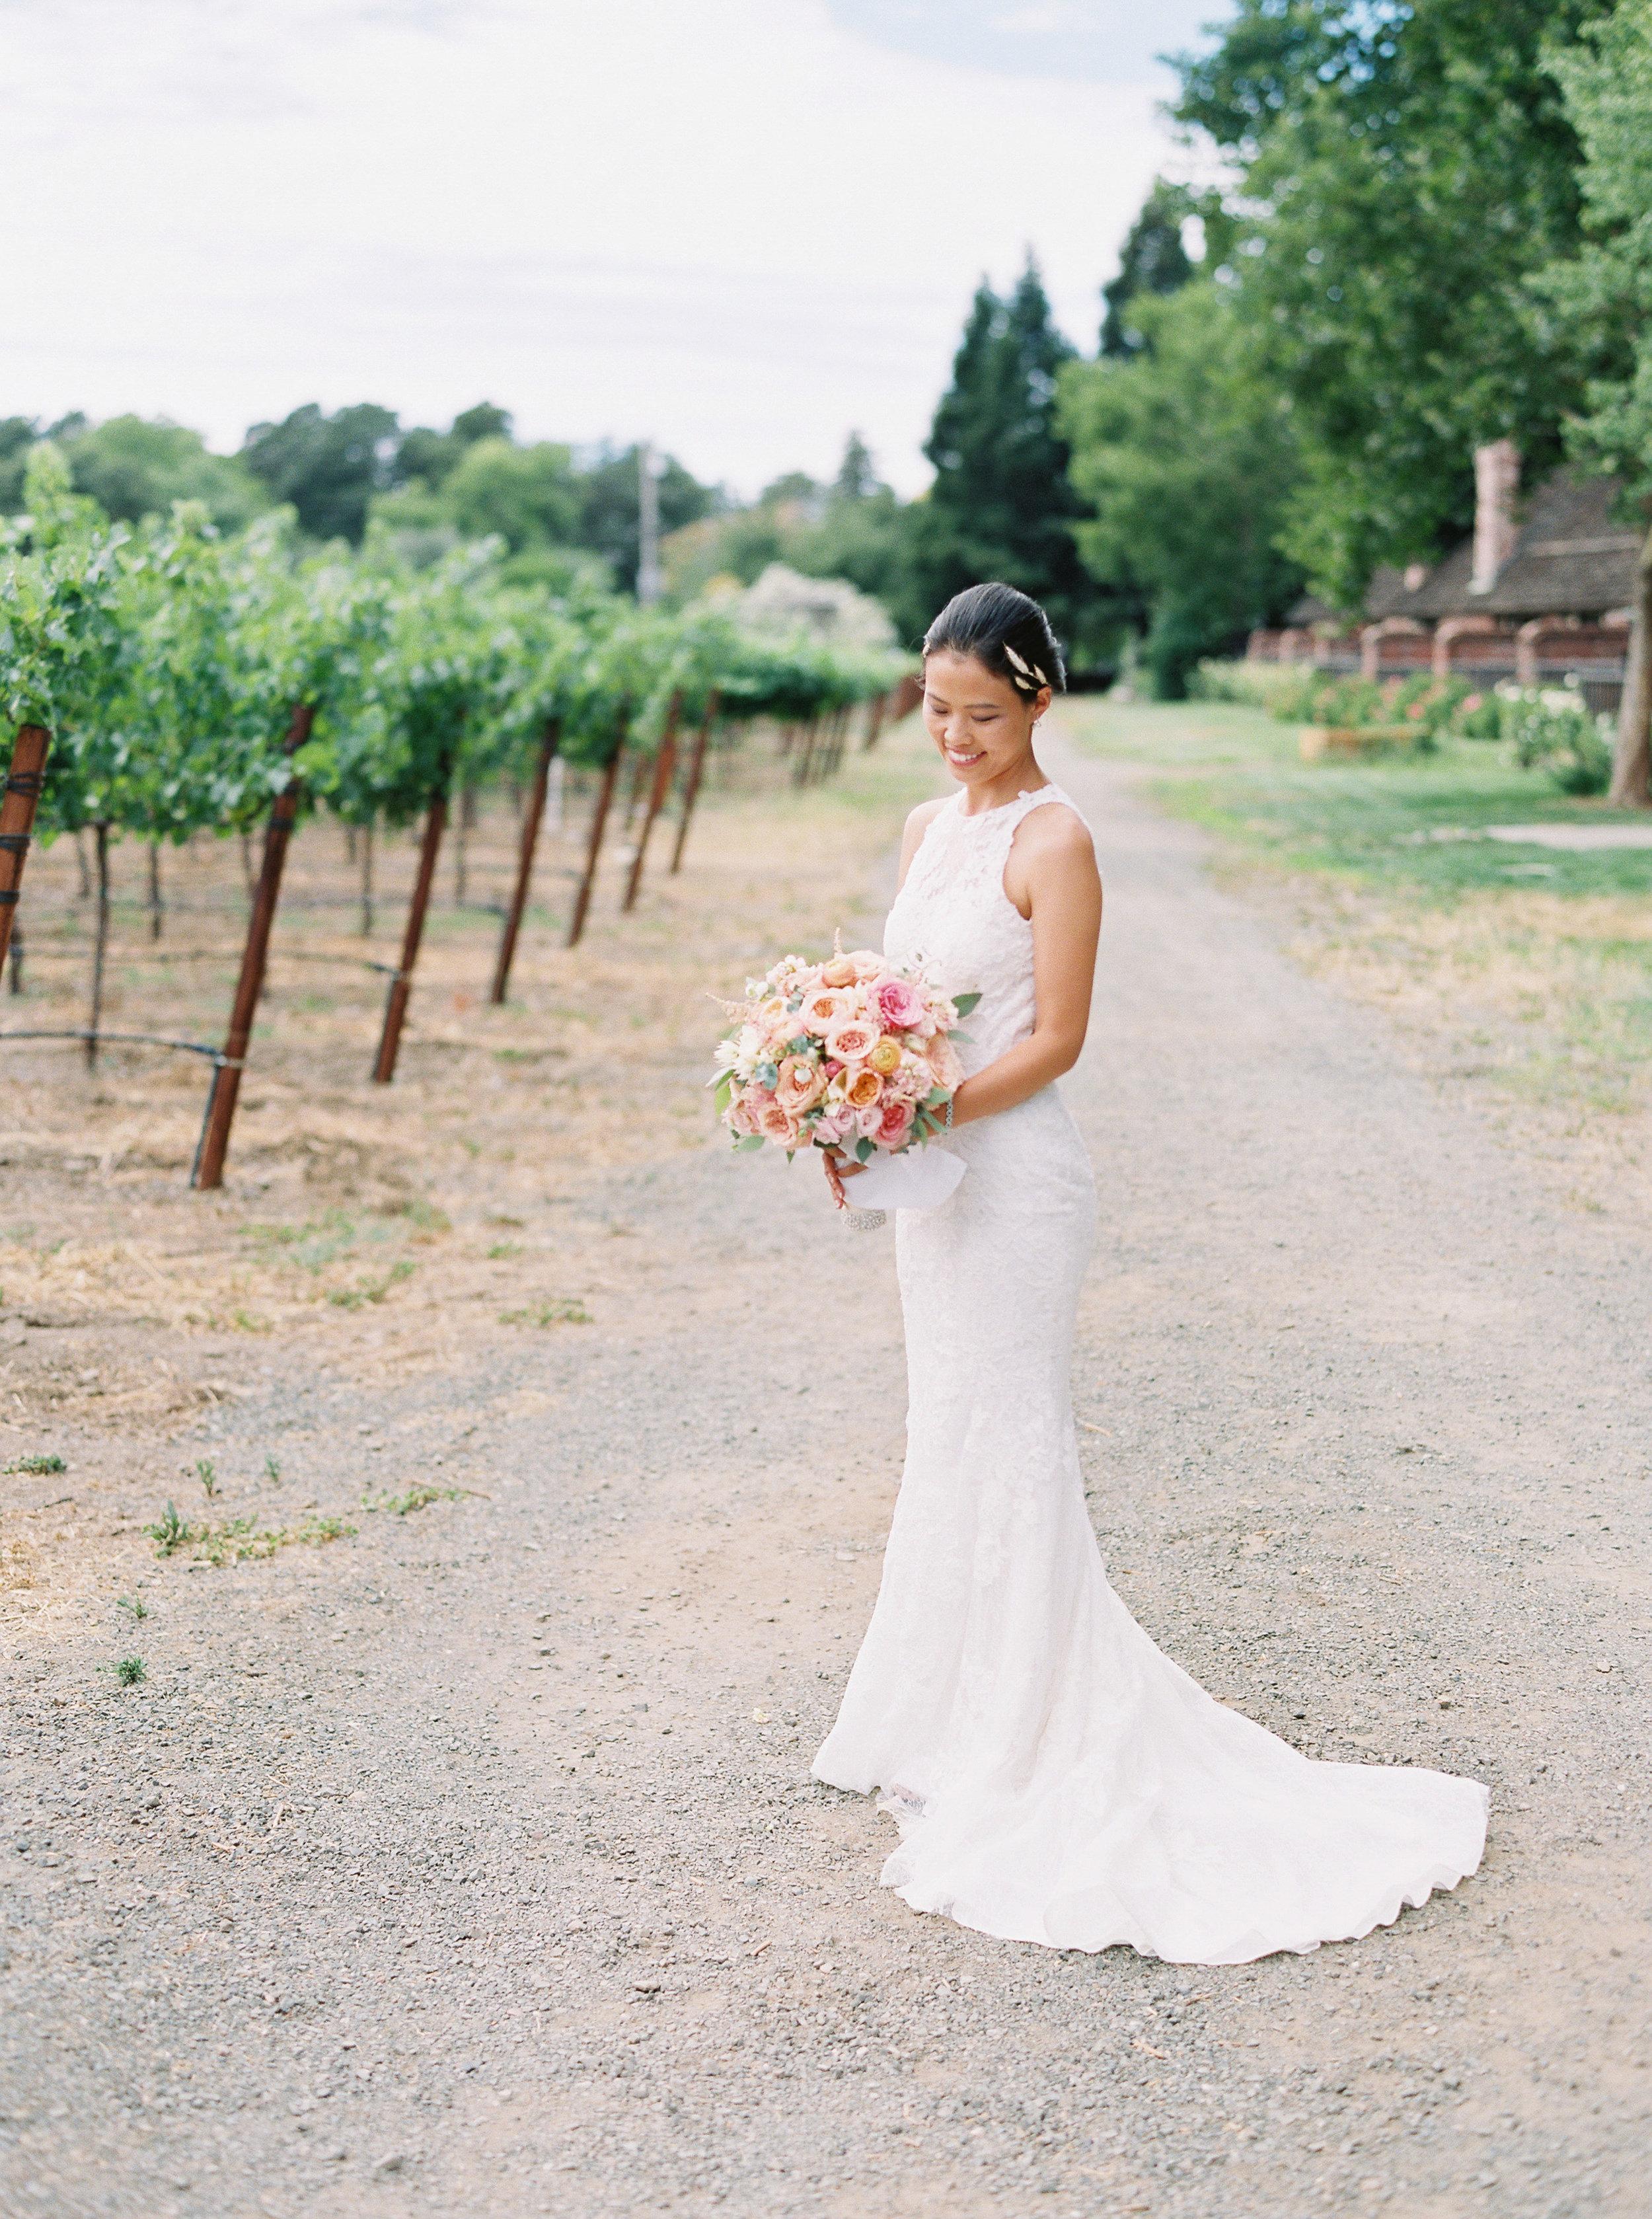 Harvest-inn-wedding-in-napa-california-161.jpg